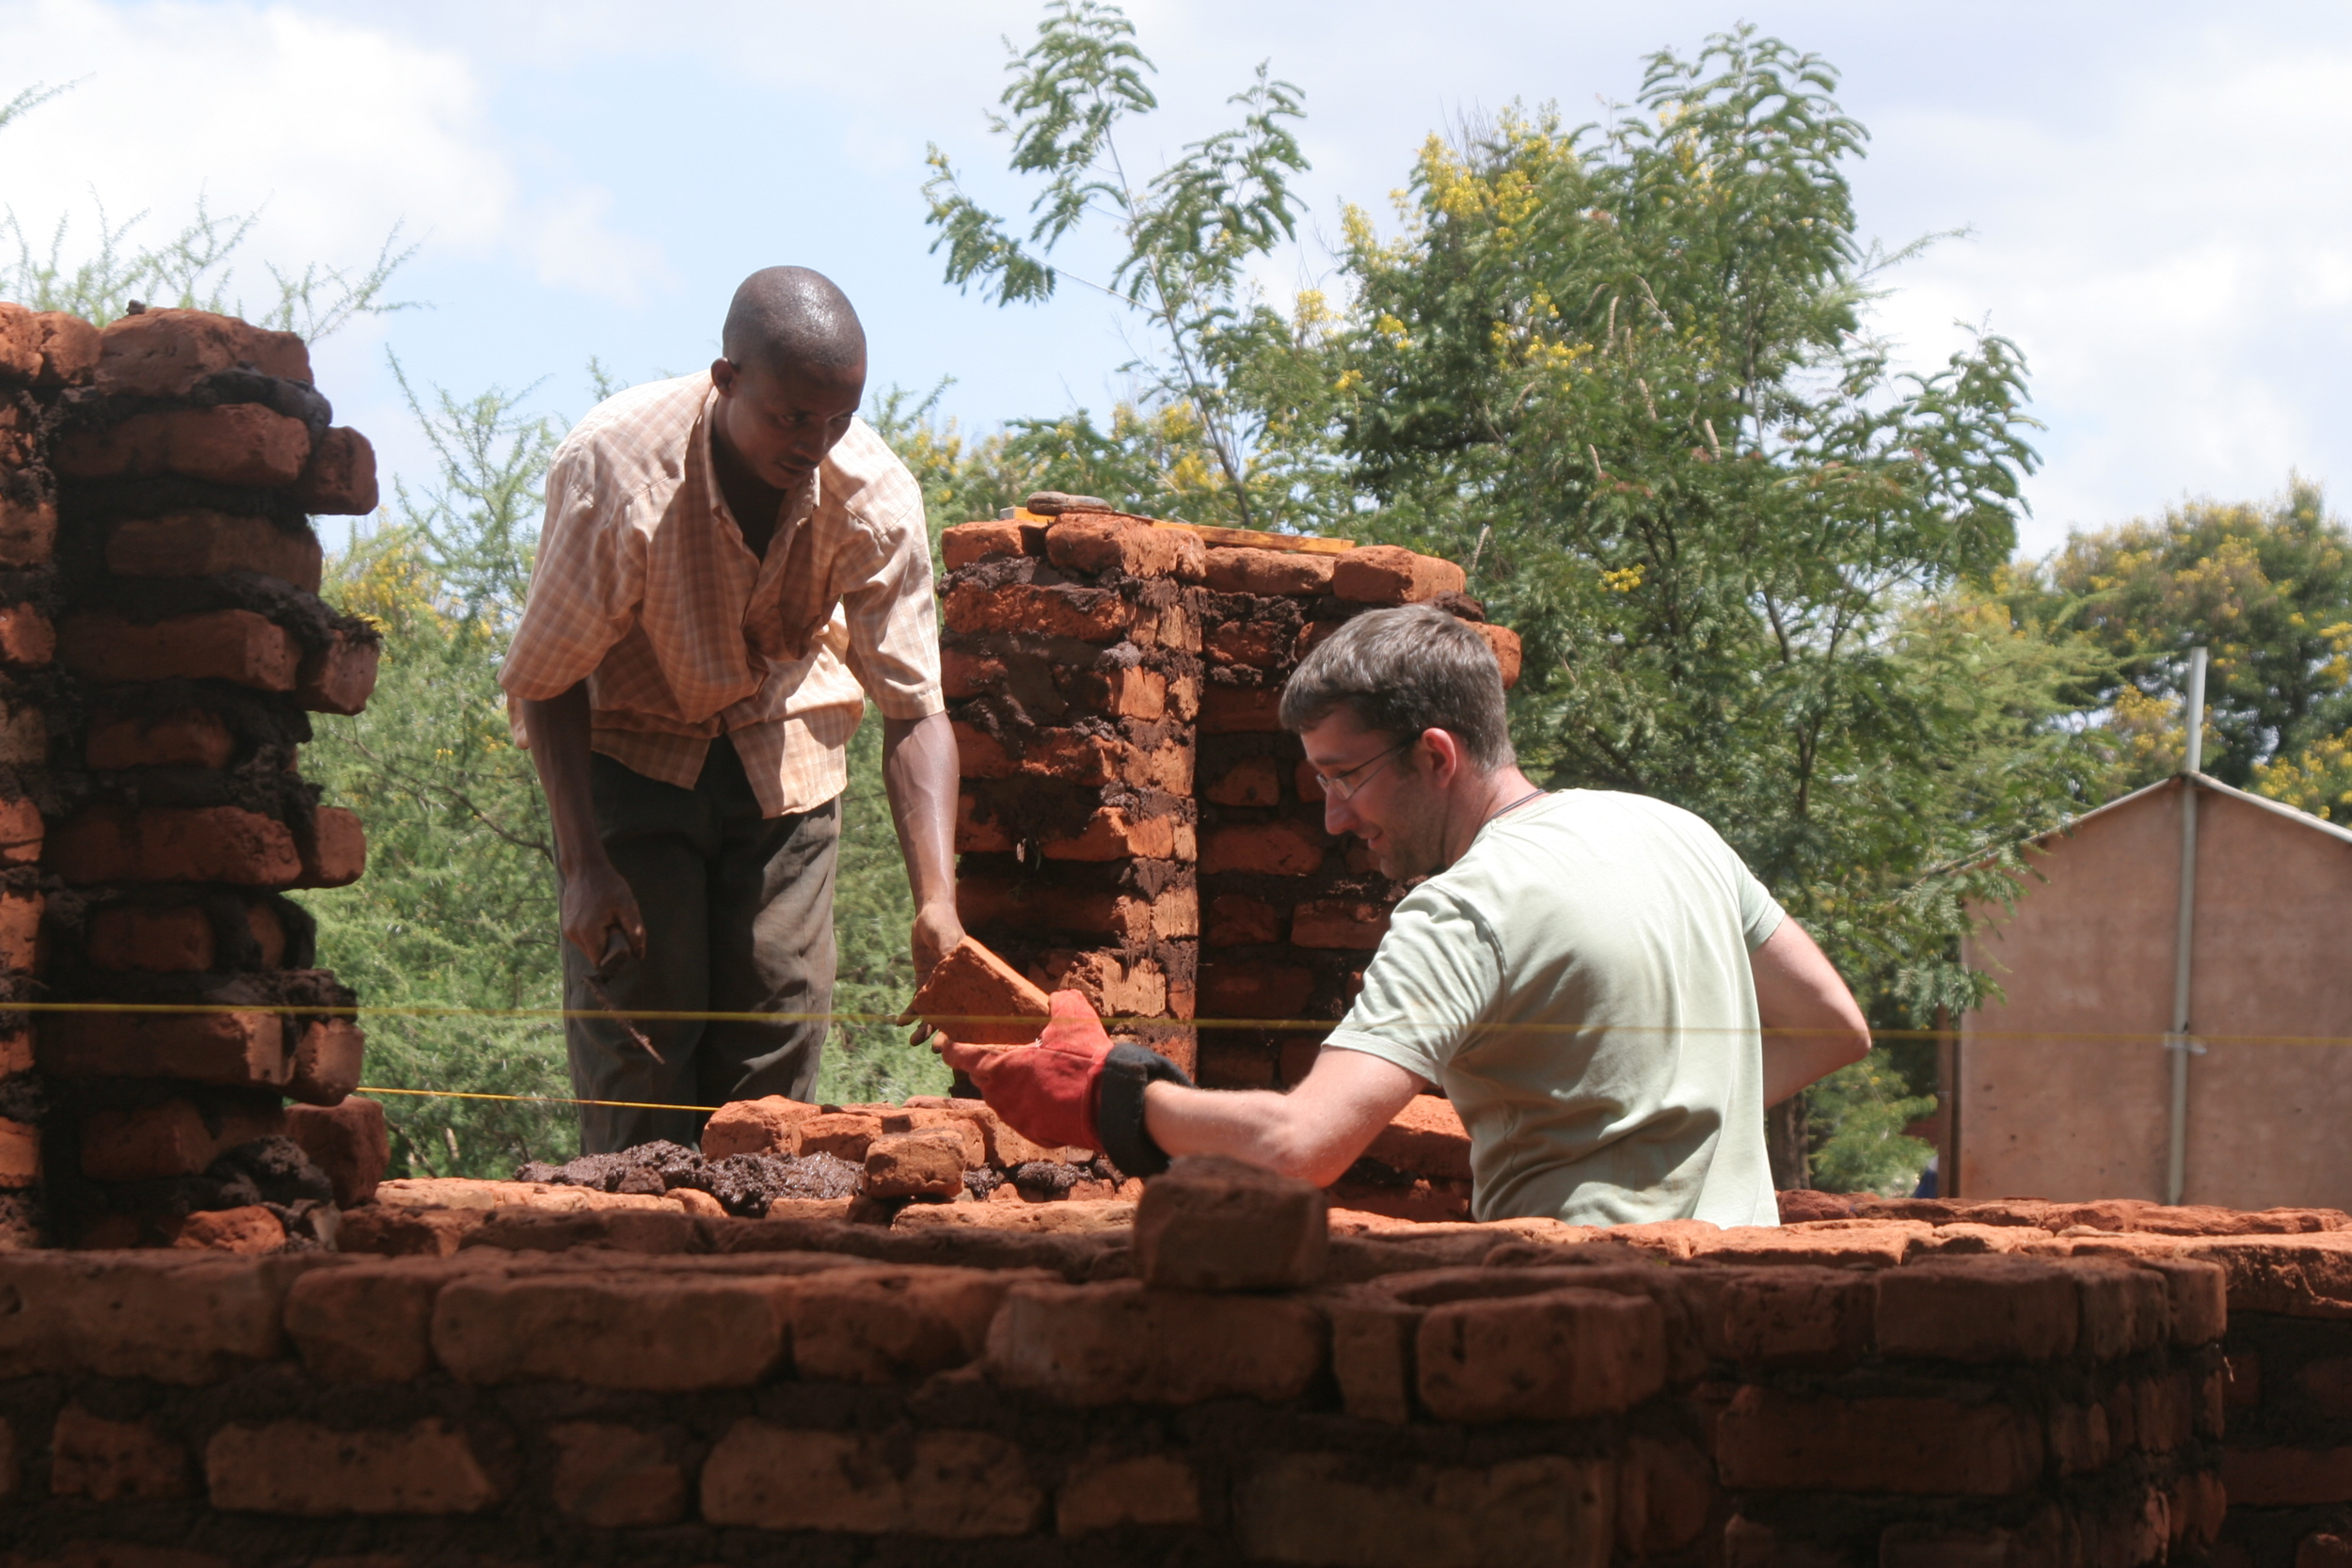 Volunteering with Livingstone Tanzania Trust